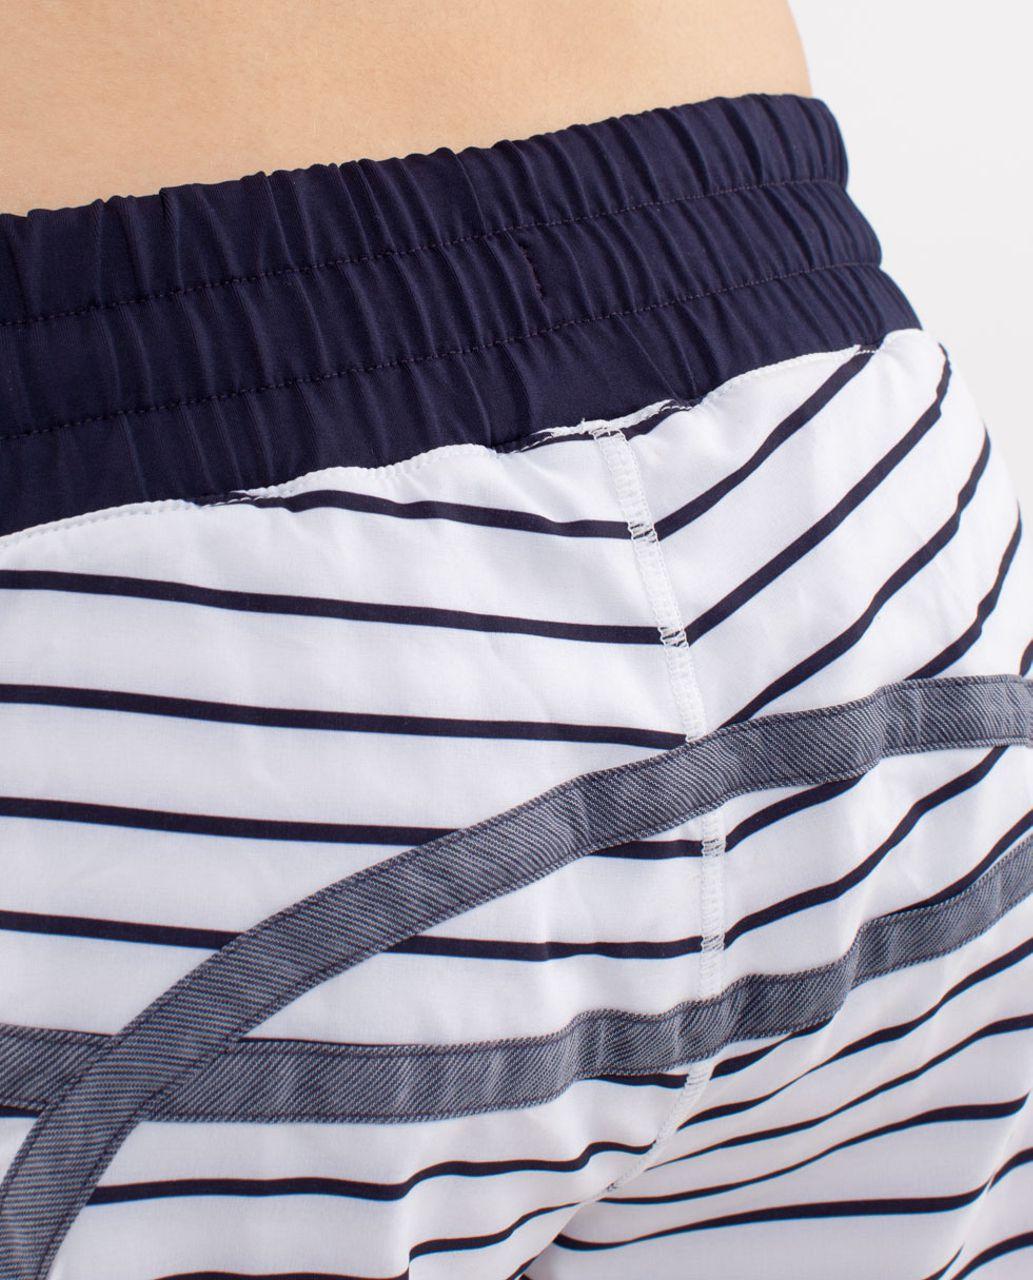 Lululemon Run:  Tracker Short II - Quiet Stripe White Deep Indigo /  Deep Indigo